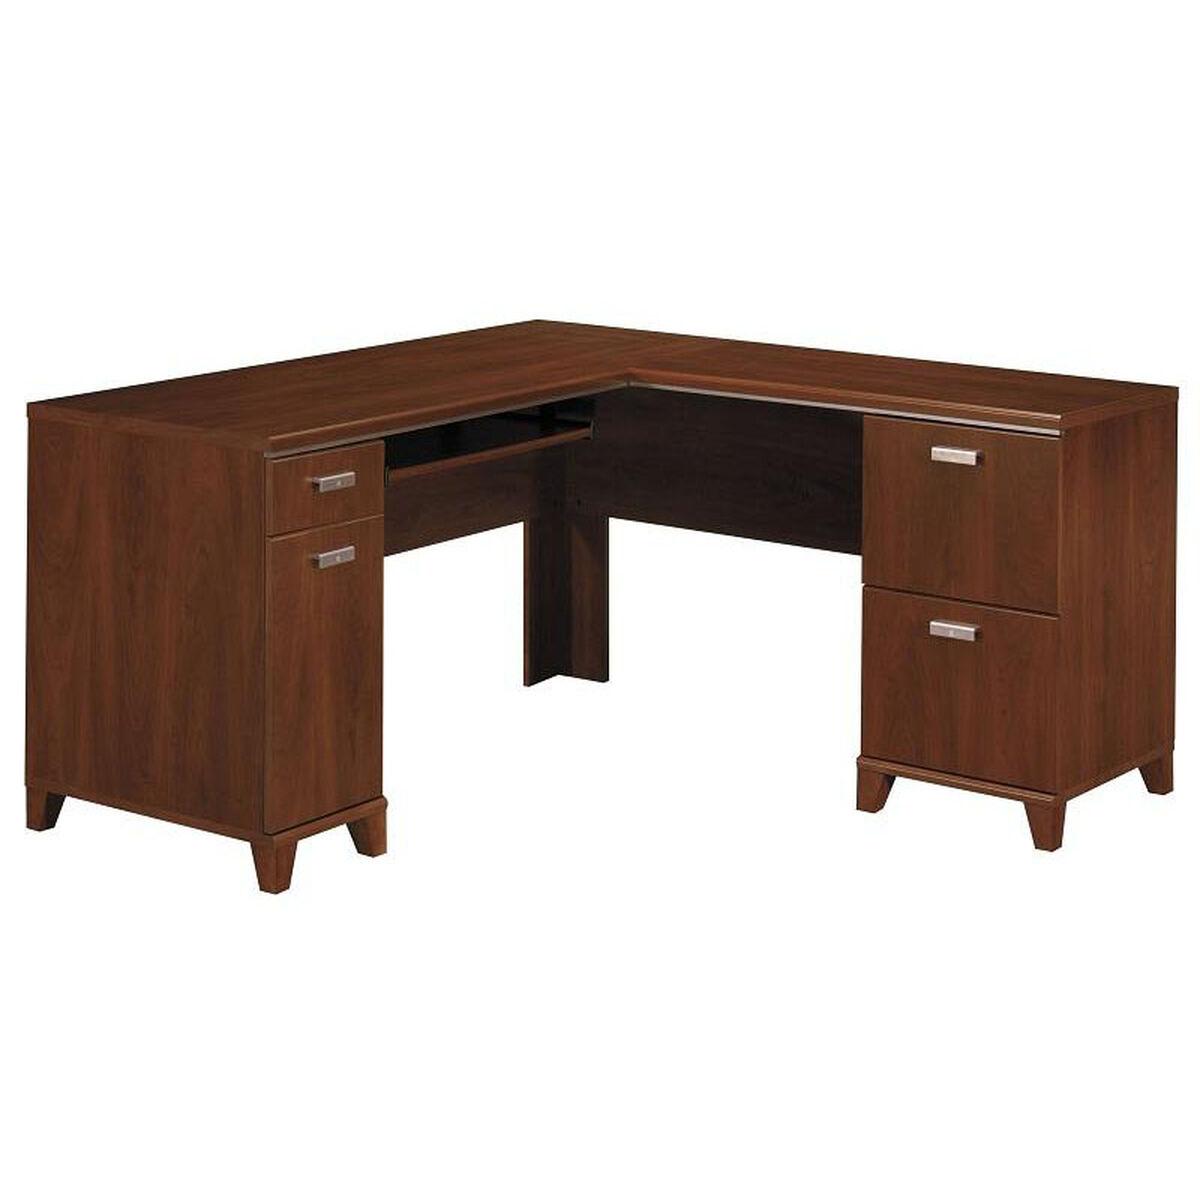 Bush home furniture wc21430 03 bhf wc21430k for Home furnishing sites